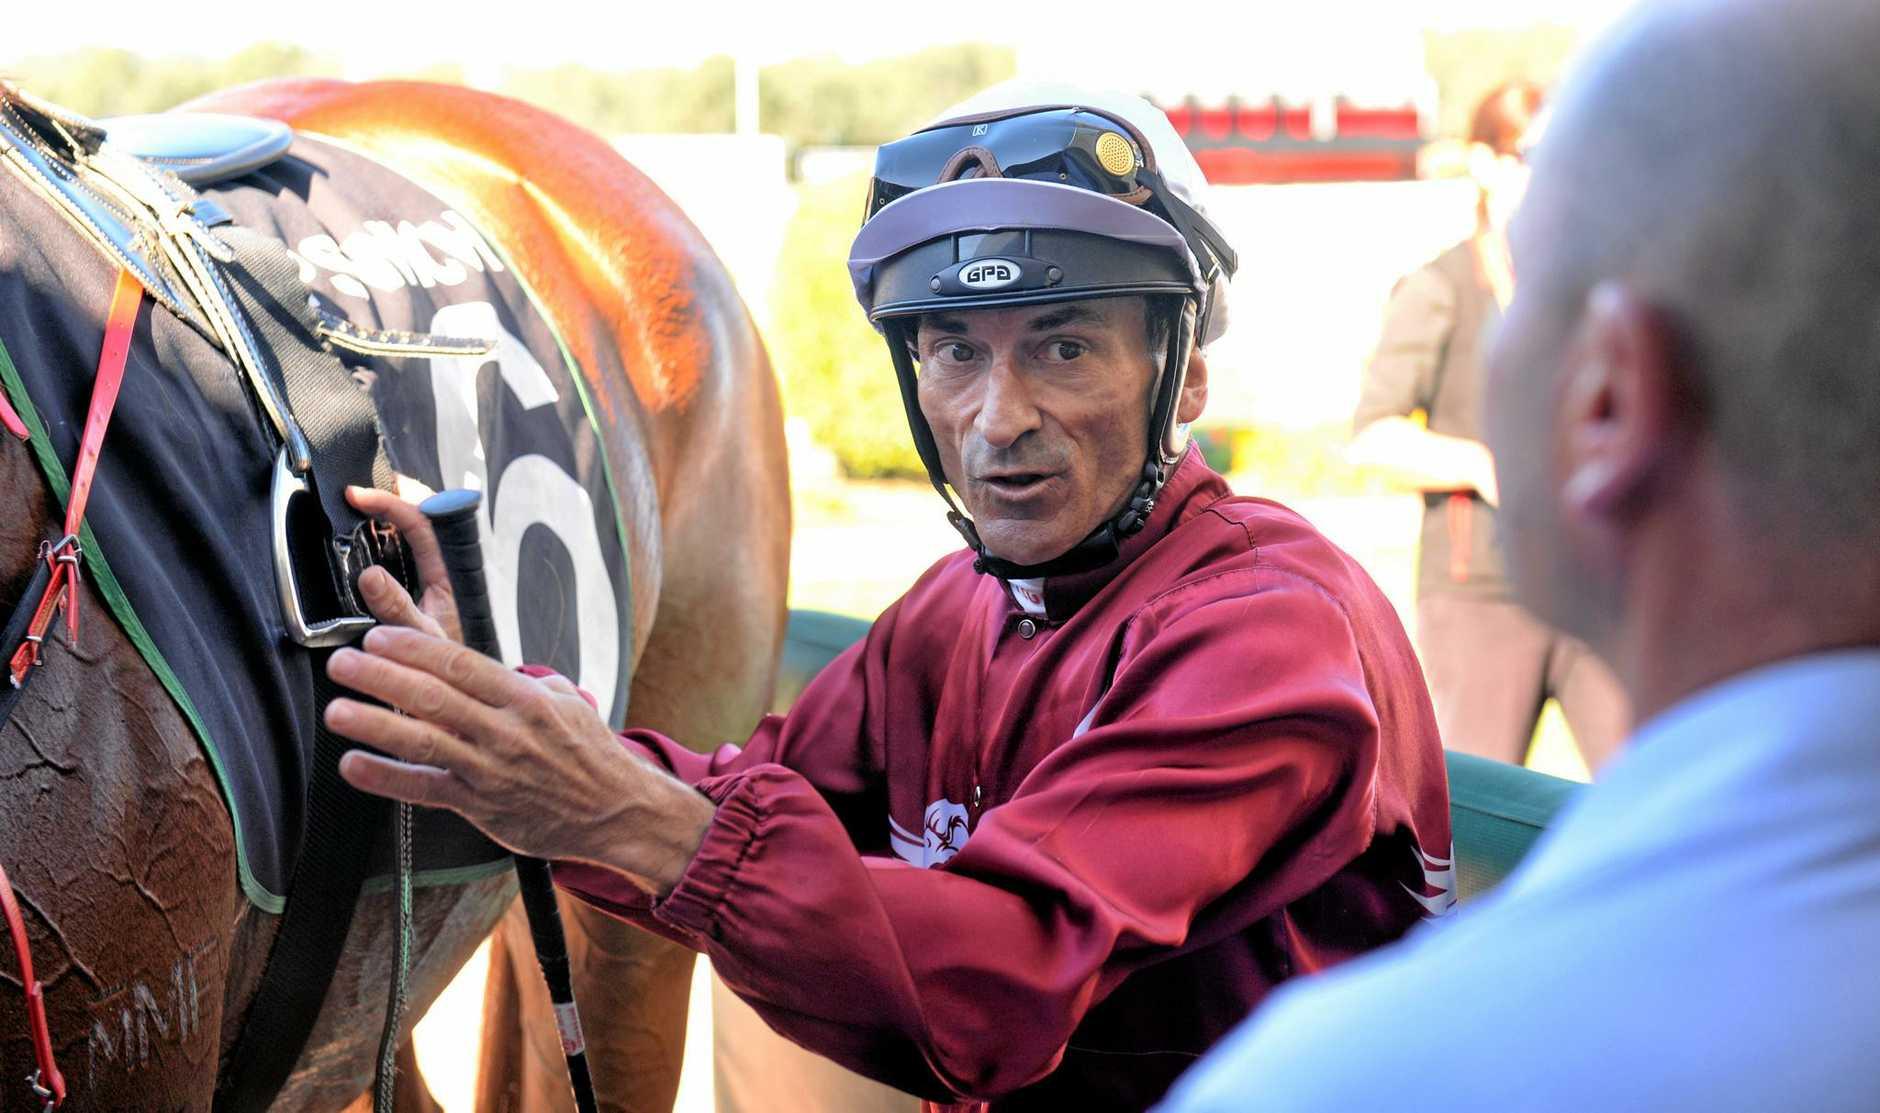 Jockey Robbie Fradd returns to the Ipswich enclosure after his winning ride aboard Divine Unicorn at the Bundamba Racetrack on Wednesday.